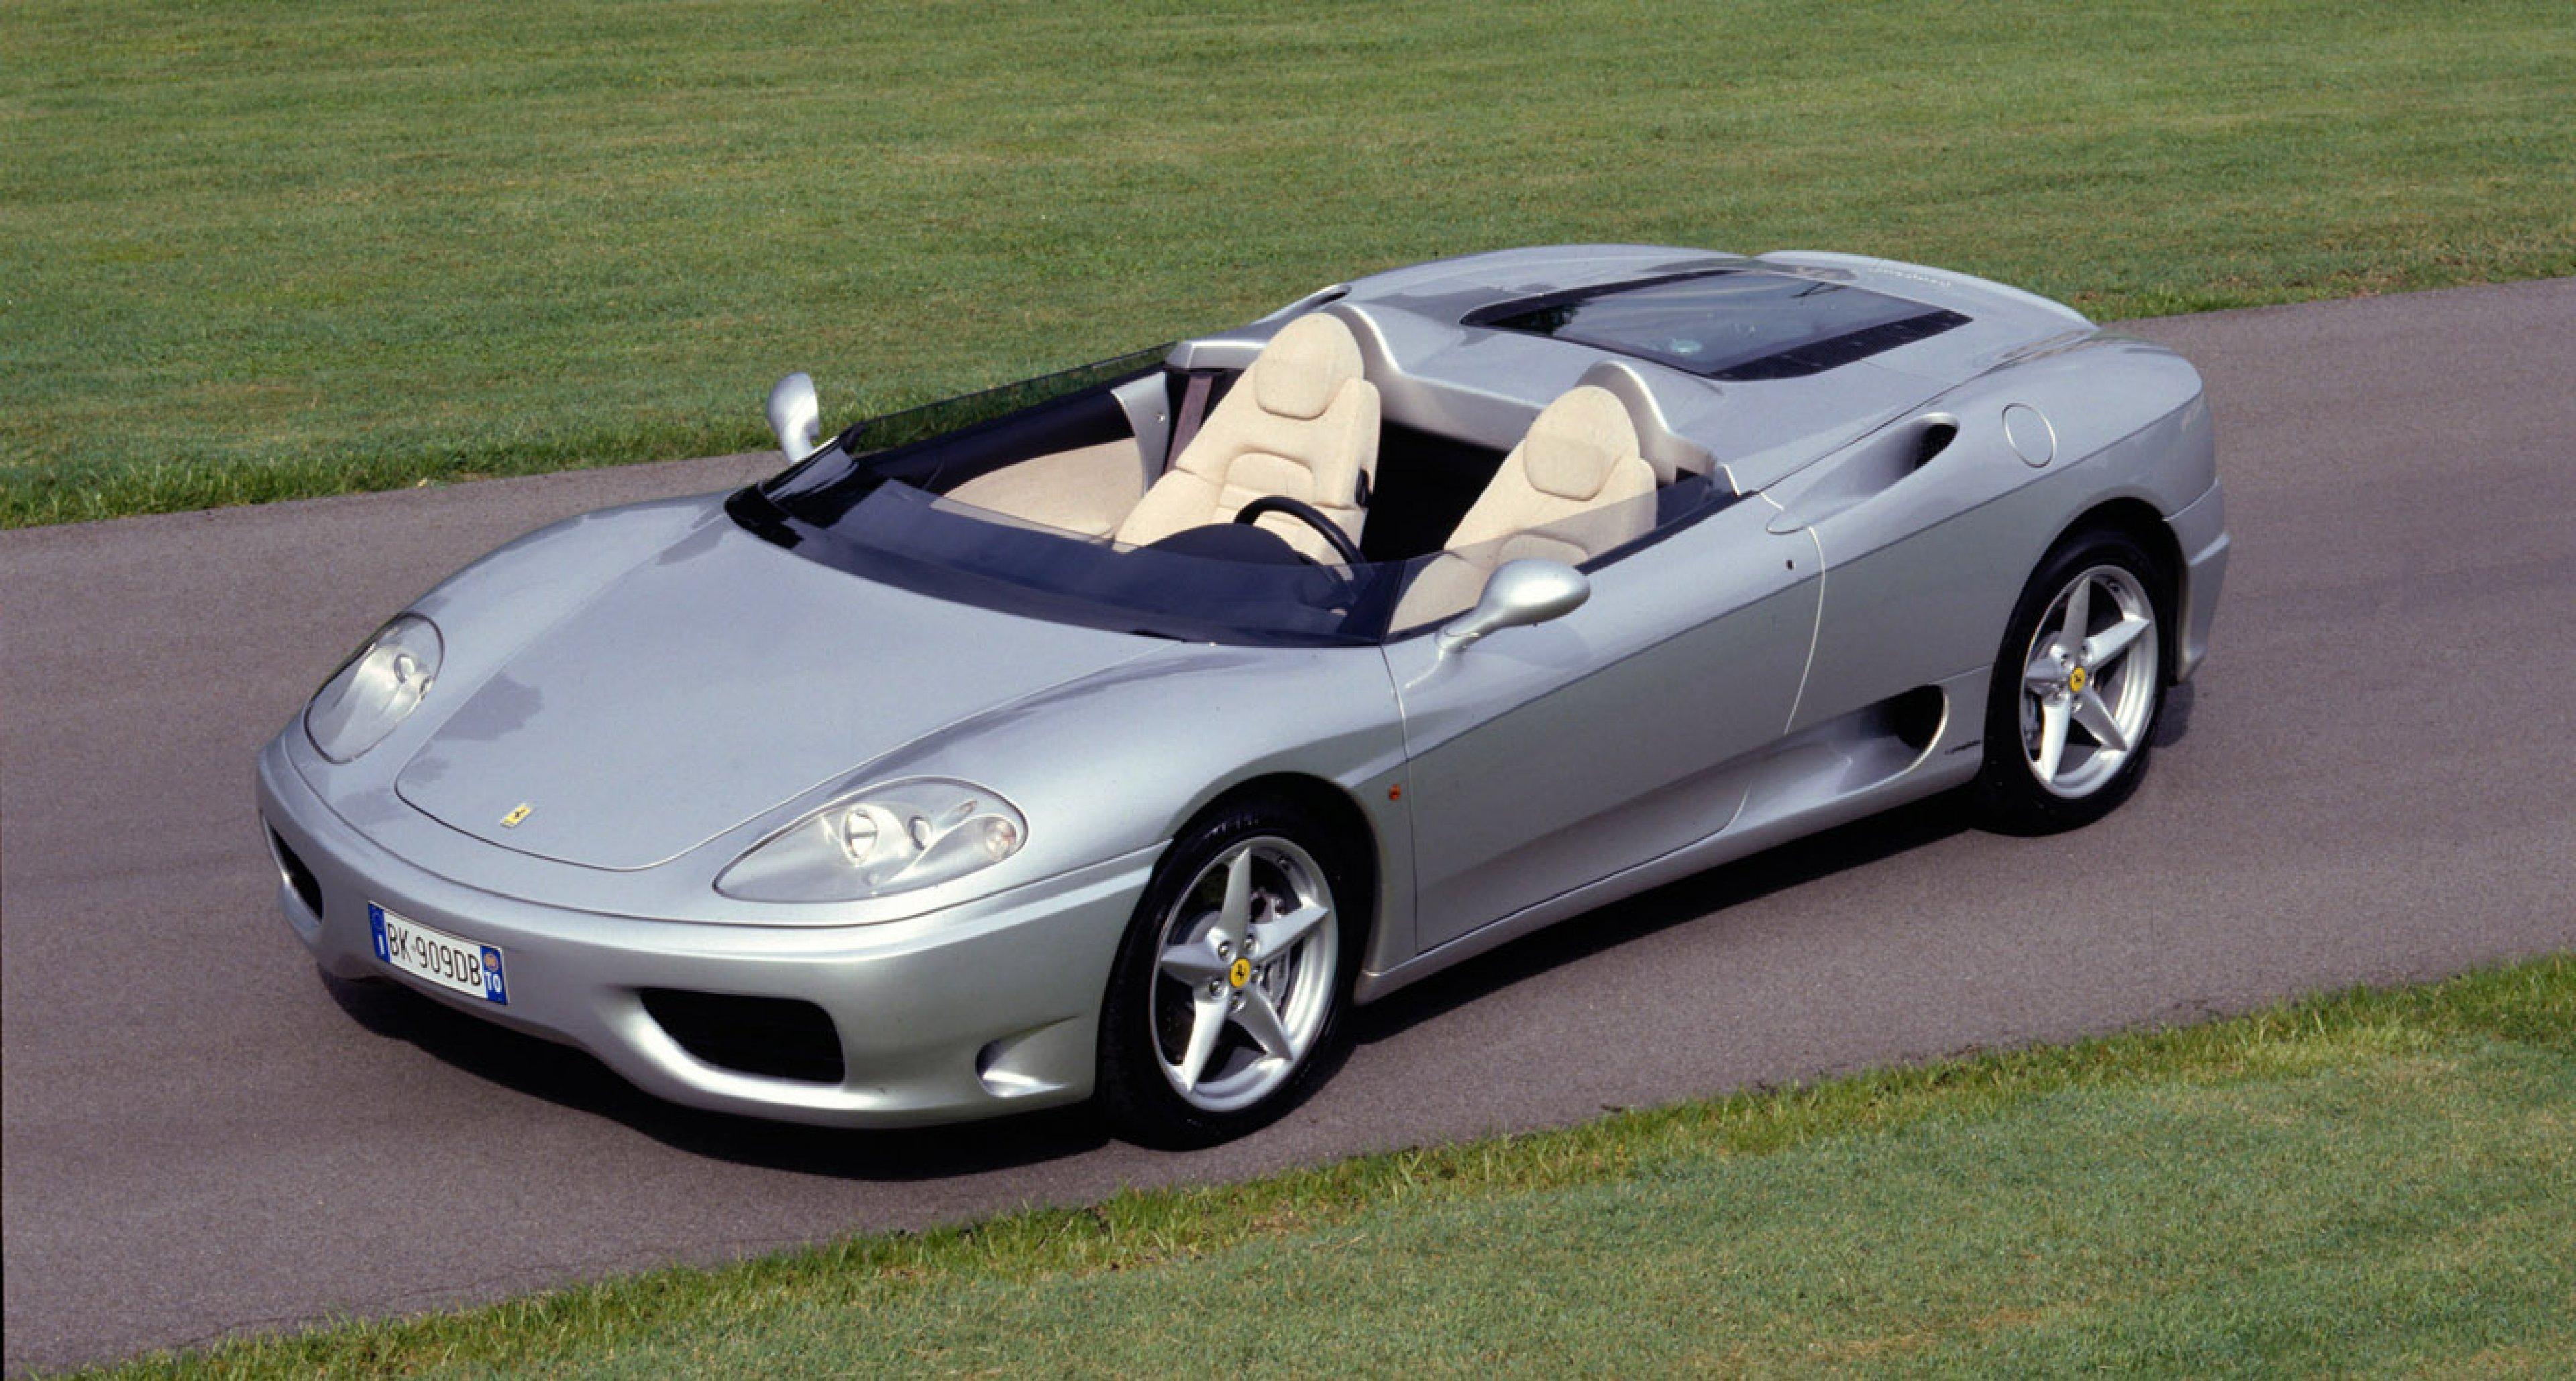 Ferrari 360 Barchetta